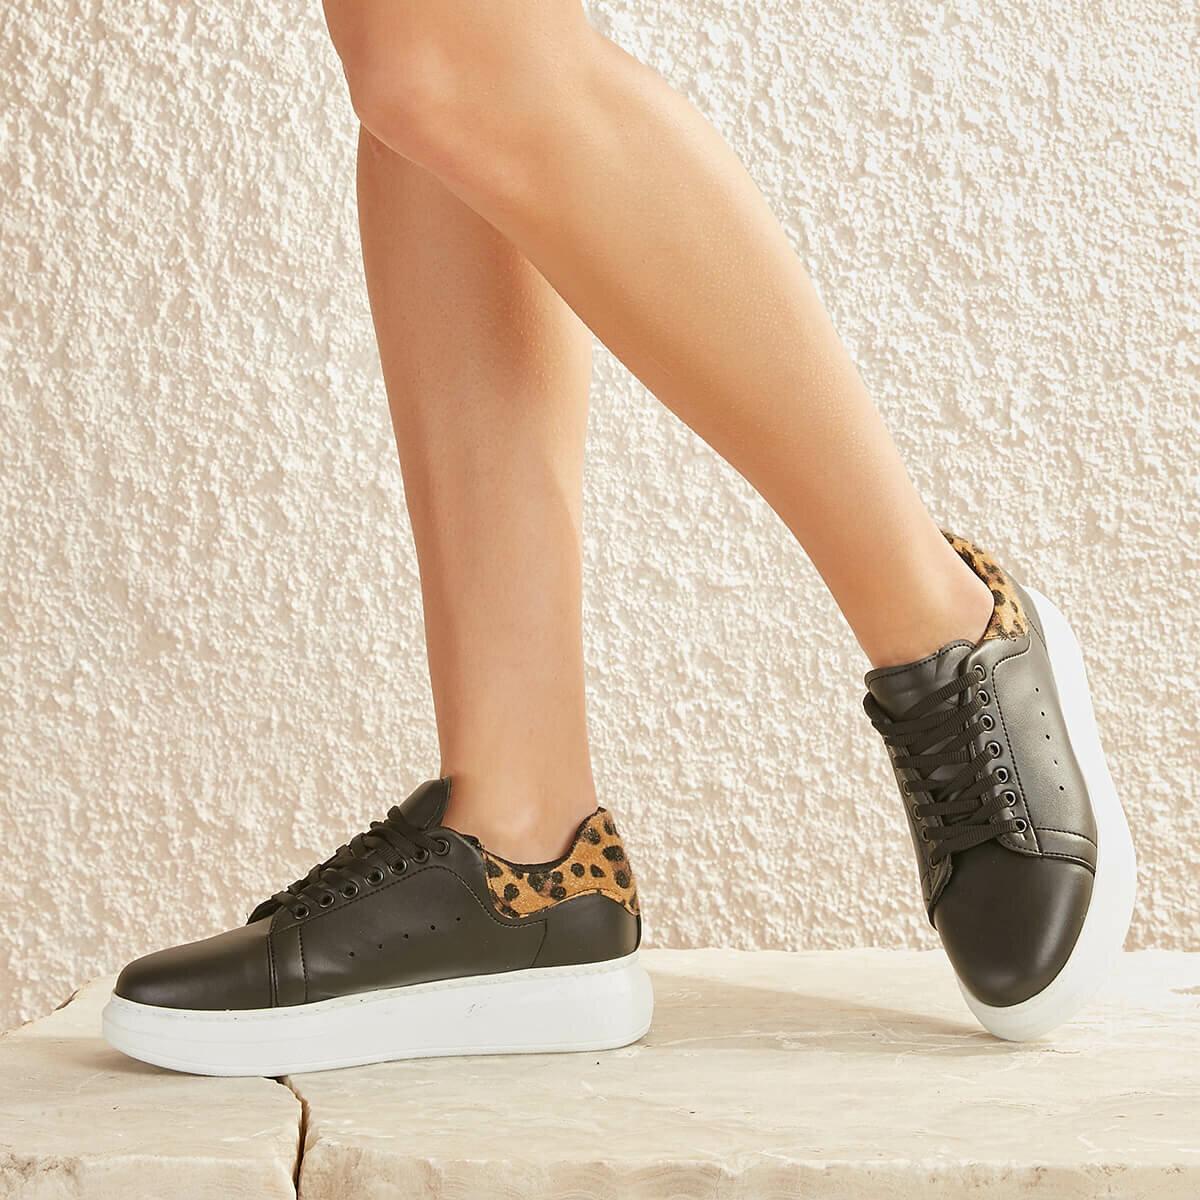 FLO MOSES89Z SKIN Leopard Women 'S Sneaker Shoes BUTIGO